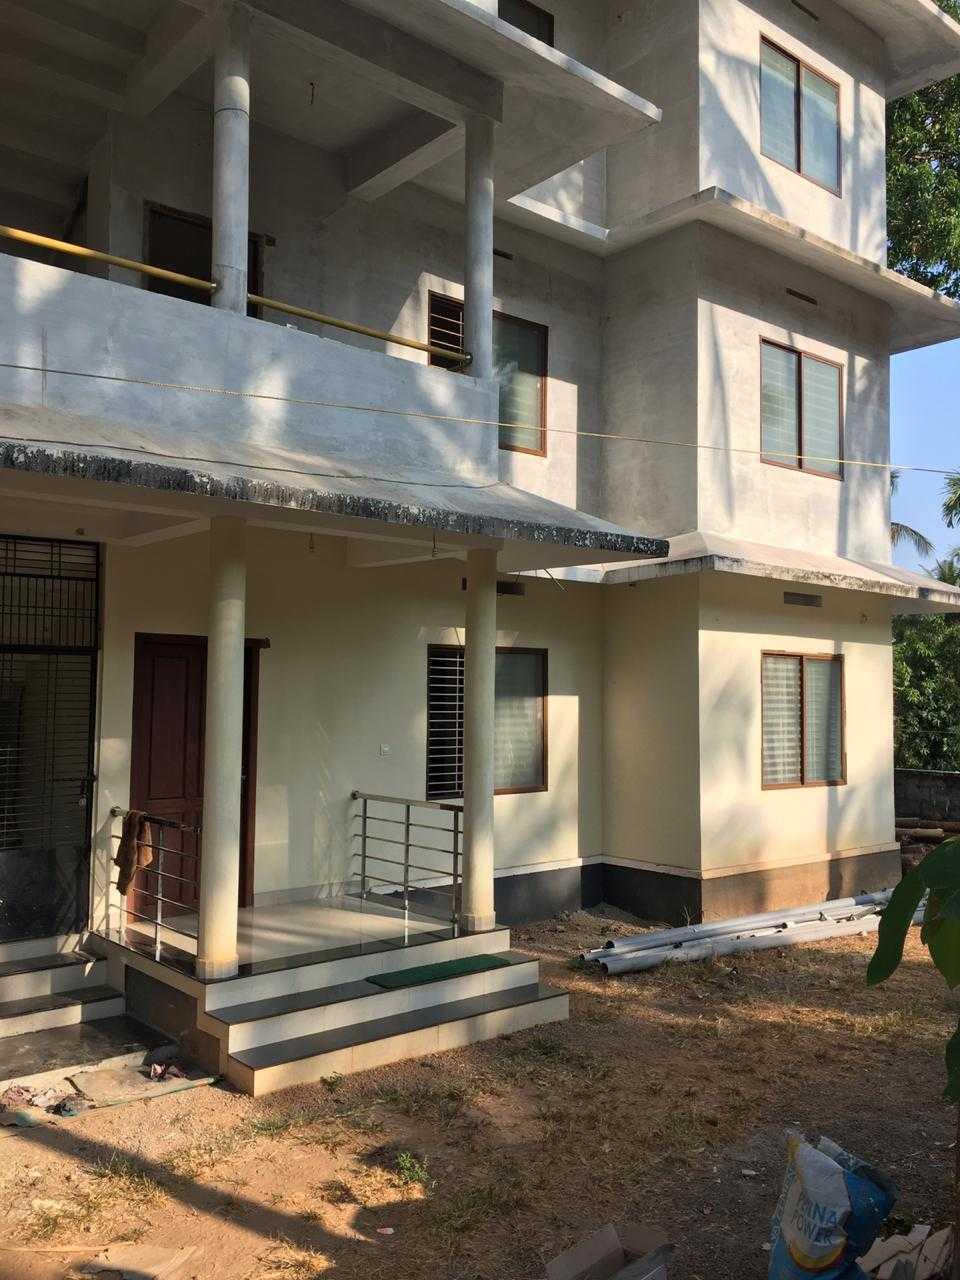 2BHK Residential Apartment For Rent At NGO Quarters, Vellimadkunnu, Calicut